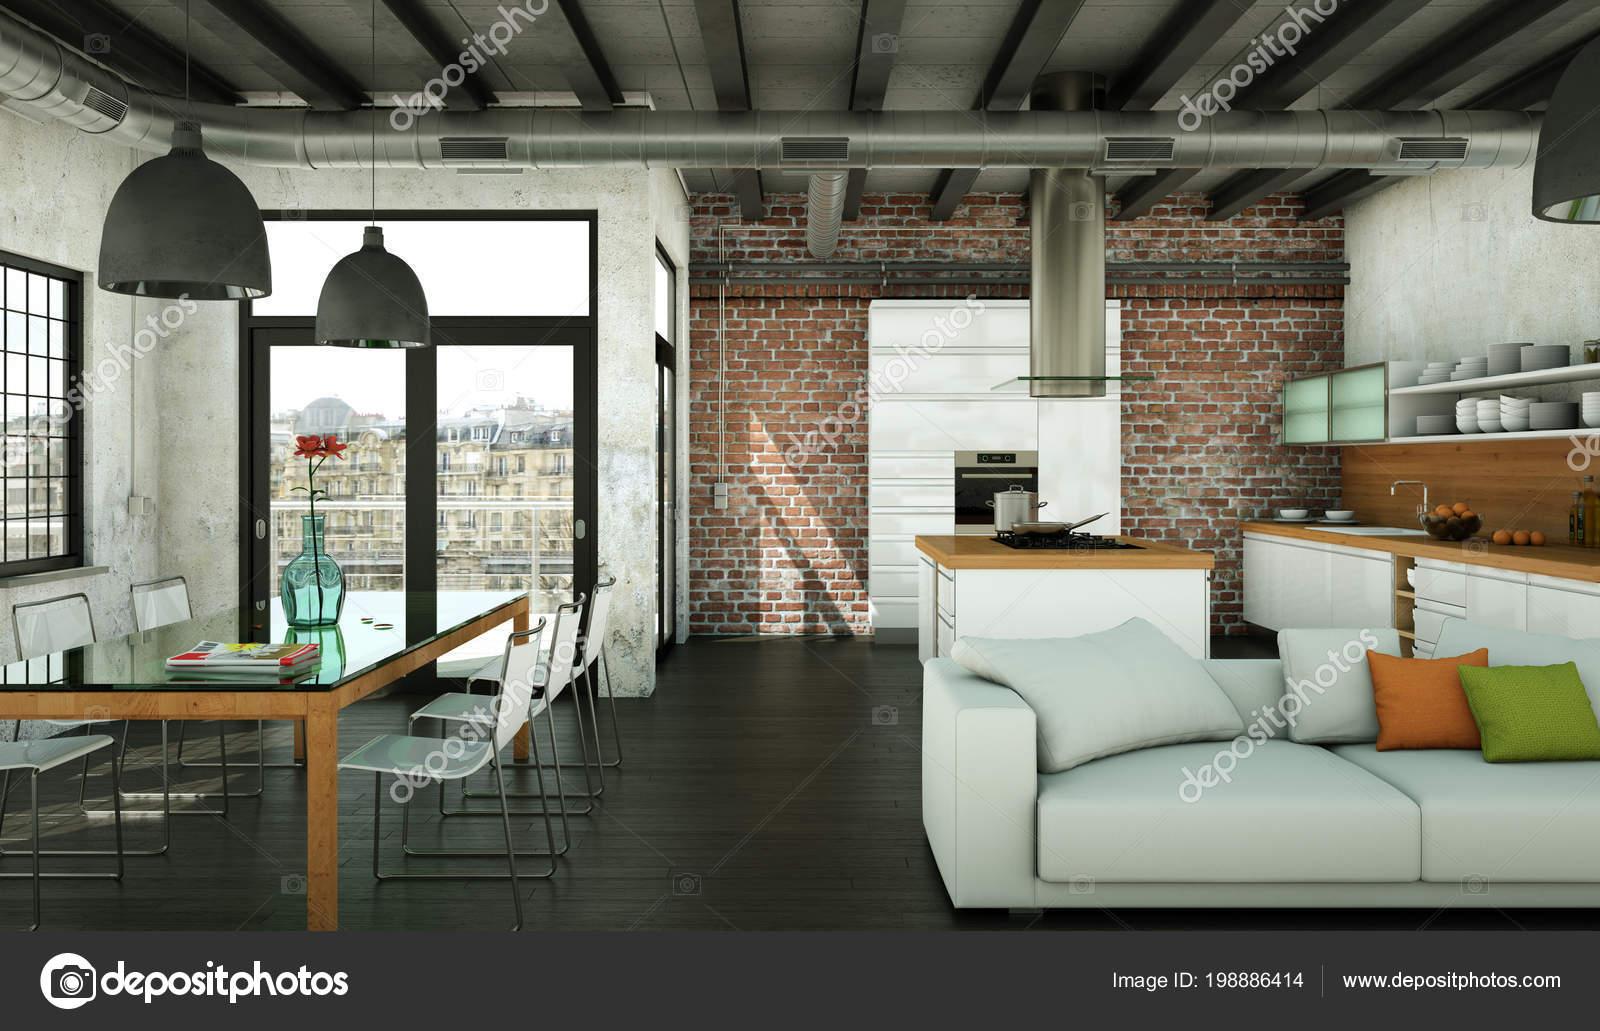 Moderne minimalistische woonkamer interieur in loft stijl met sofa